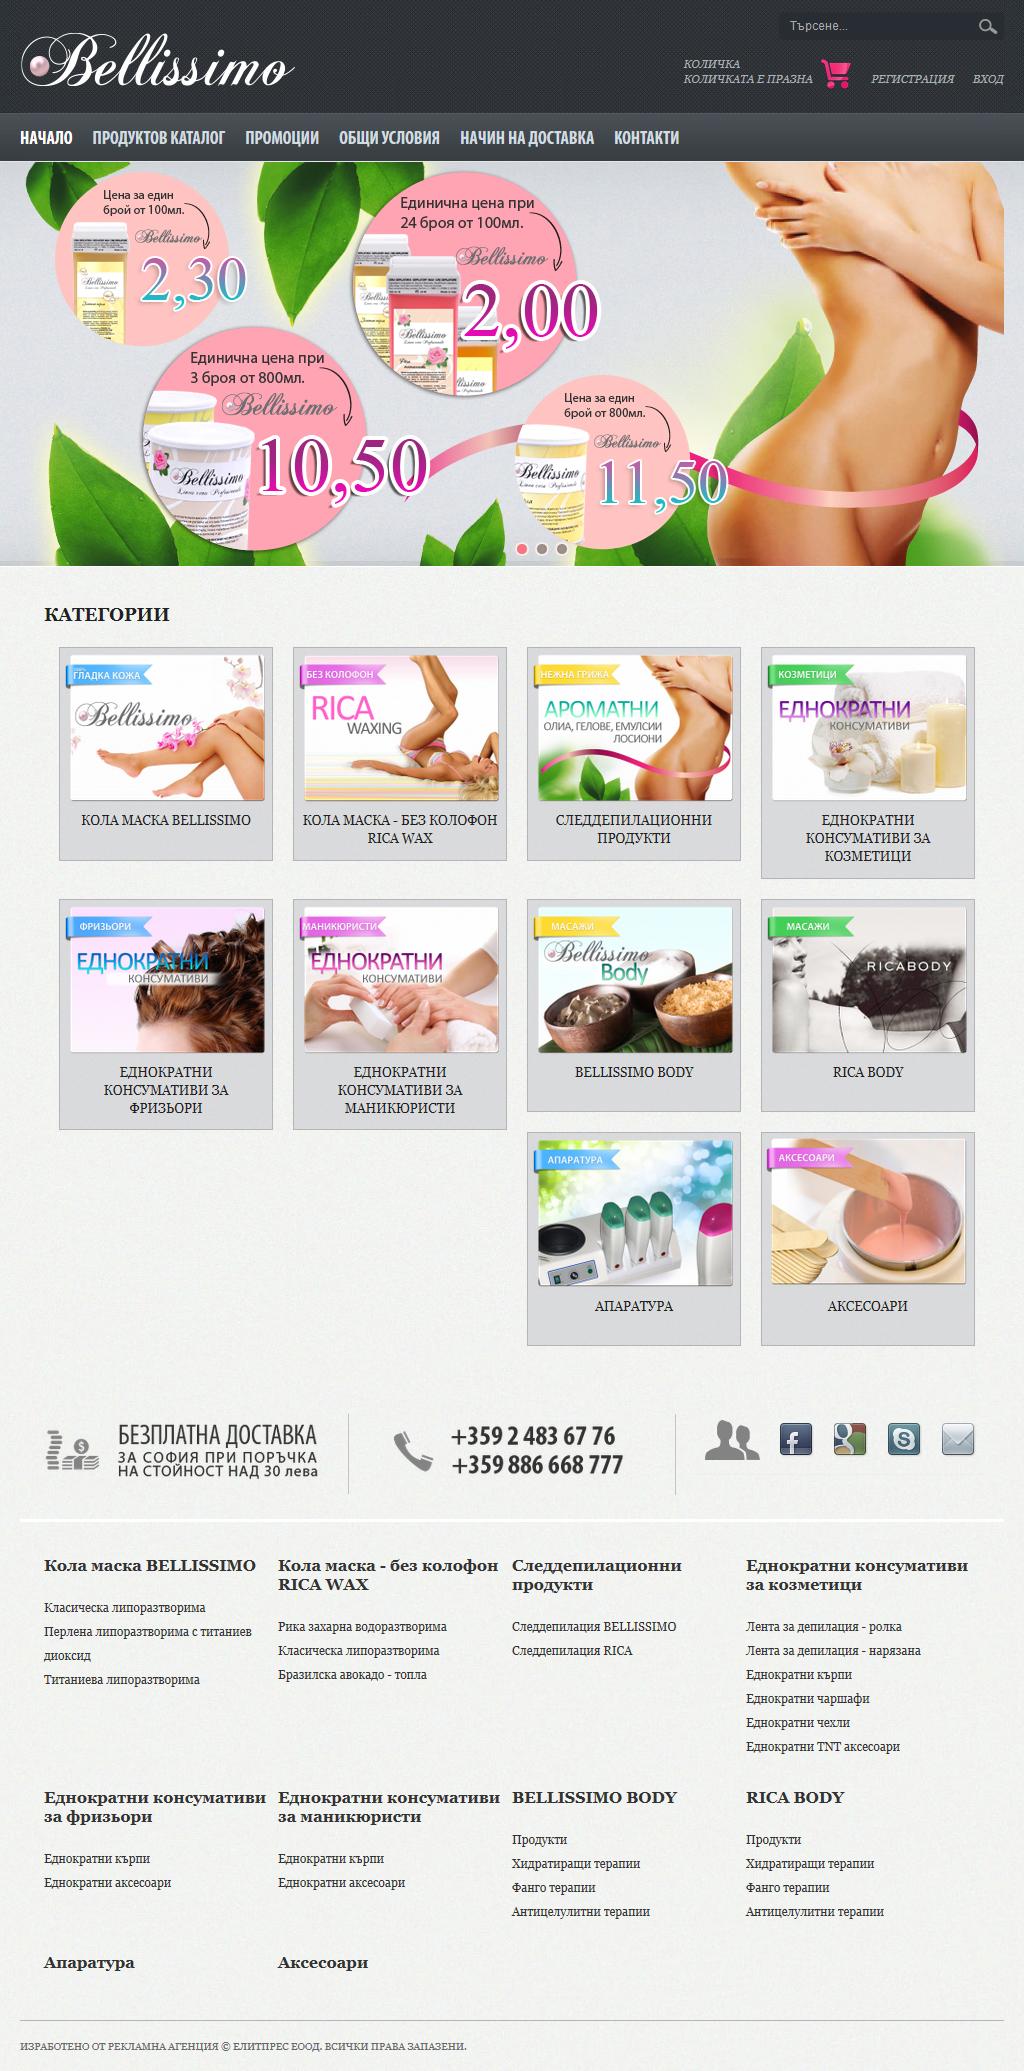 Bellissimo cosmetics